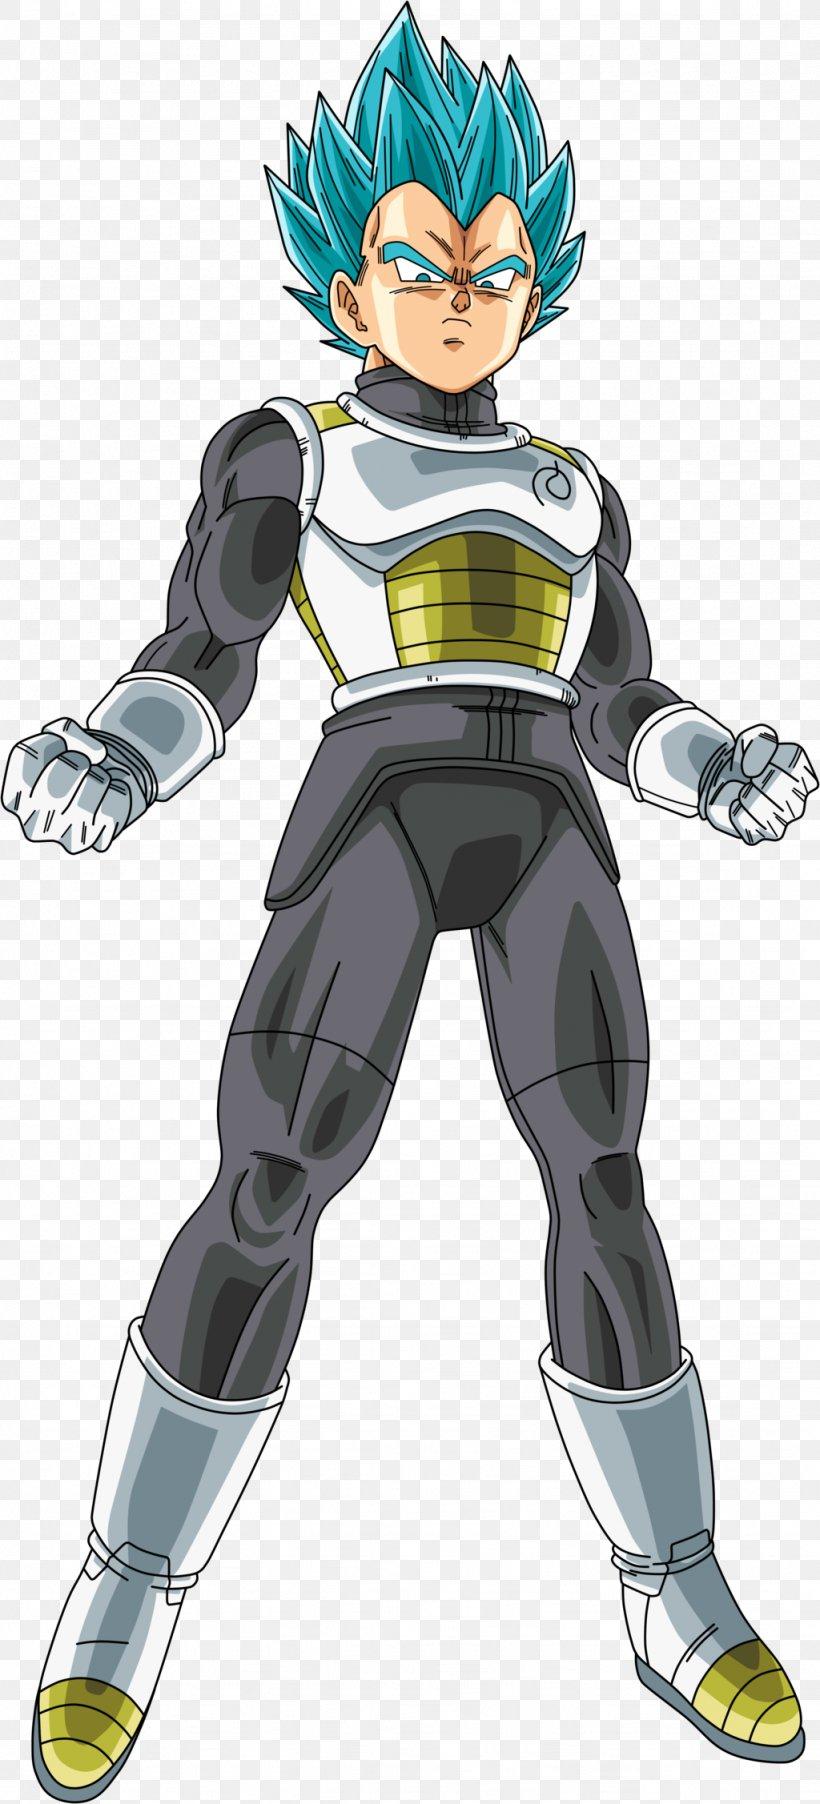 Vegeta Goku Frieza Trunks Super Saiya, PNG, 1024x2254px, Watercolor, Cartoon, Flower, Frame, Heart Download Free